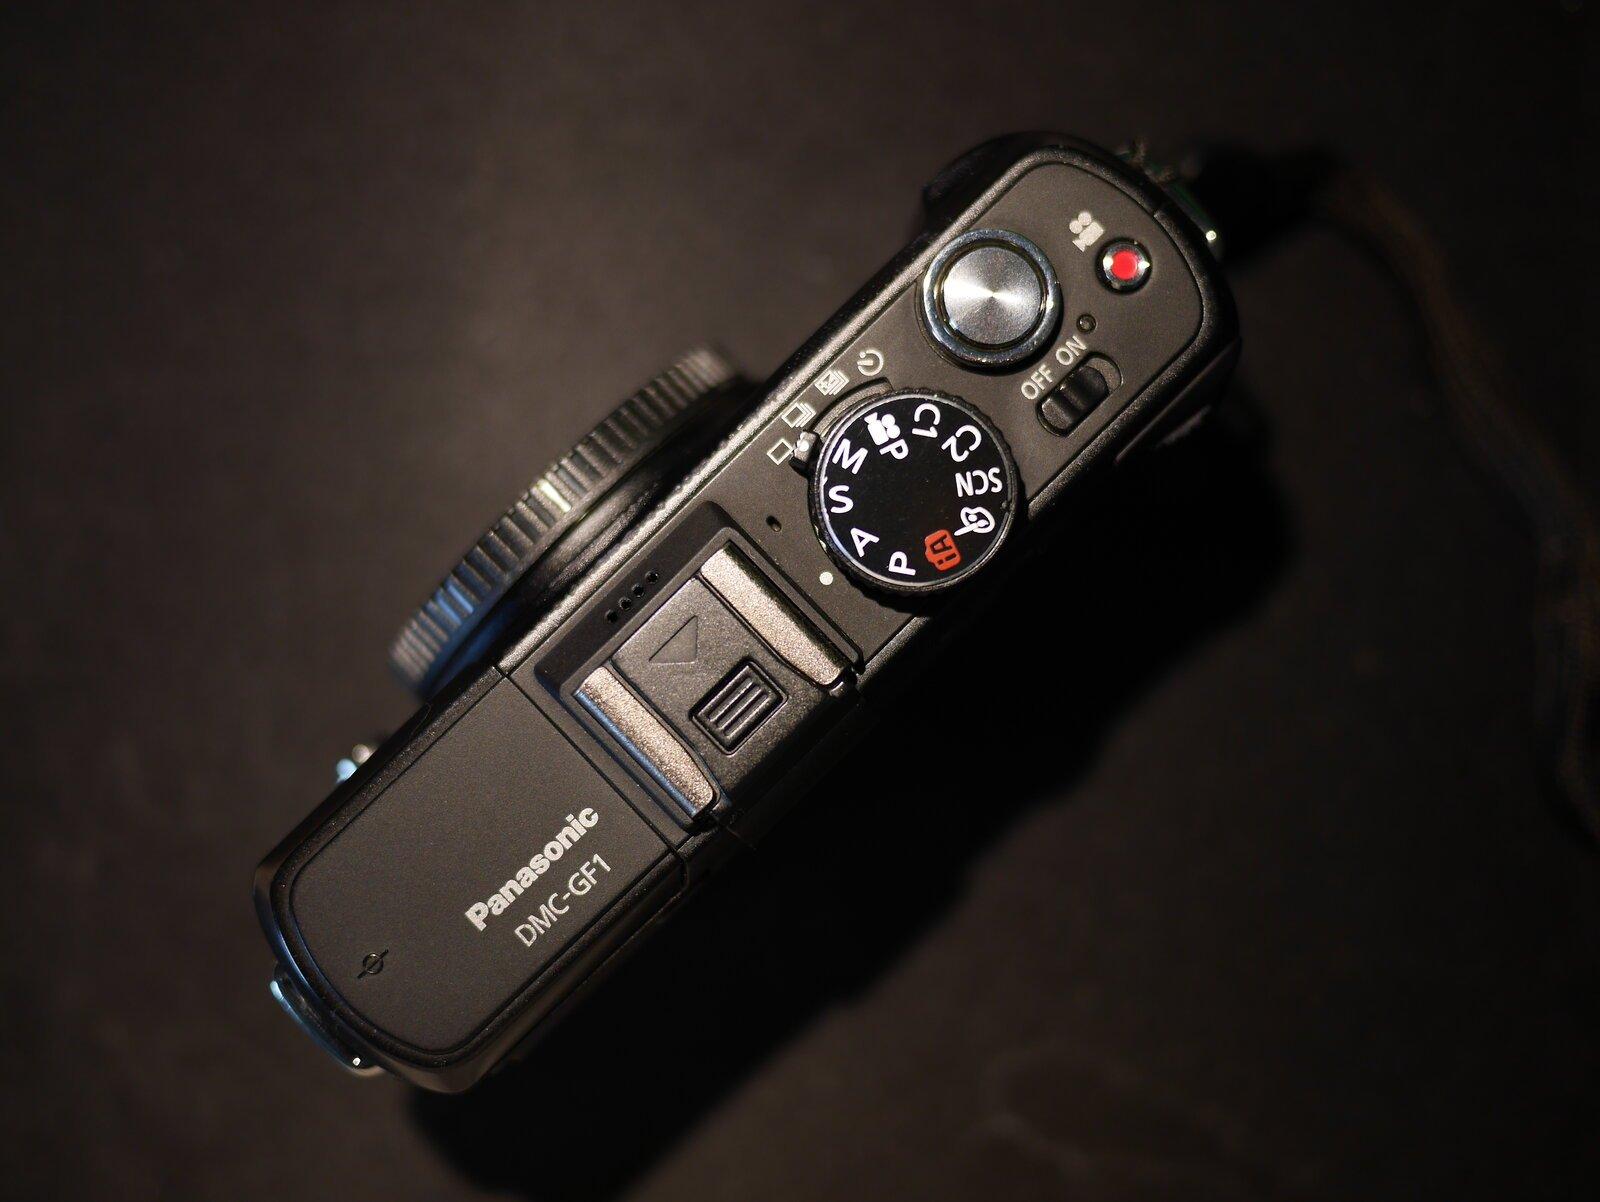 P1190324.JPG